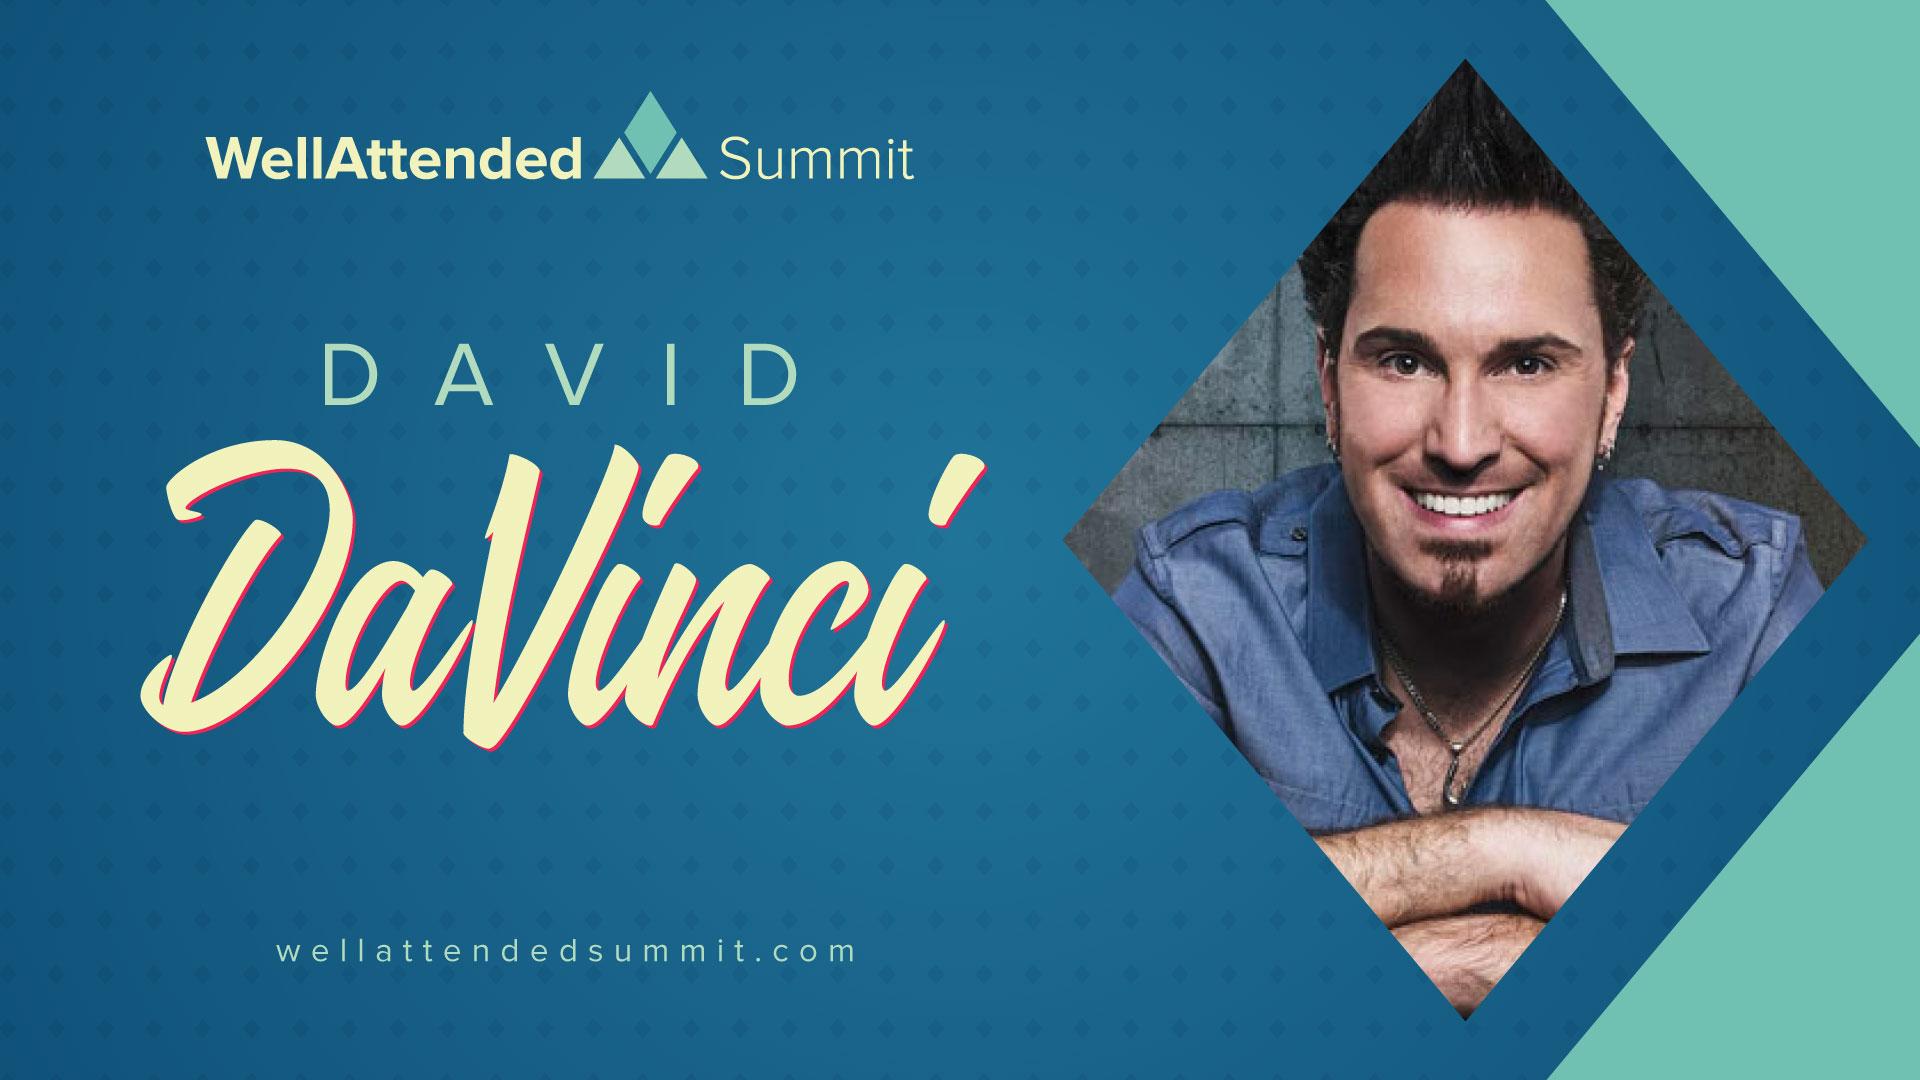 Celebrity summit cruise director